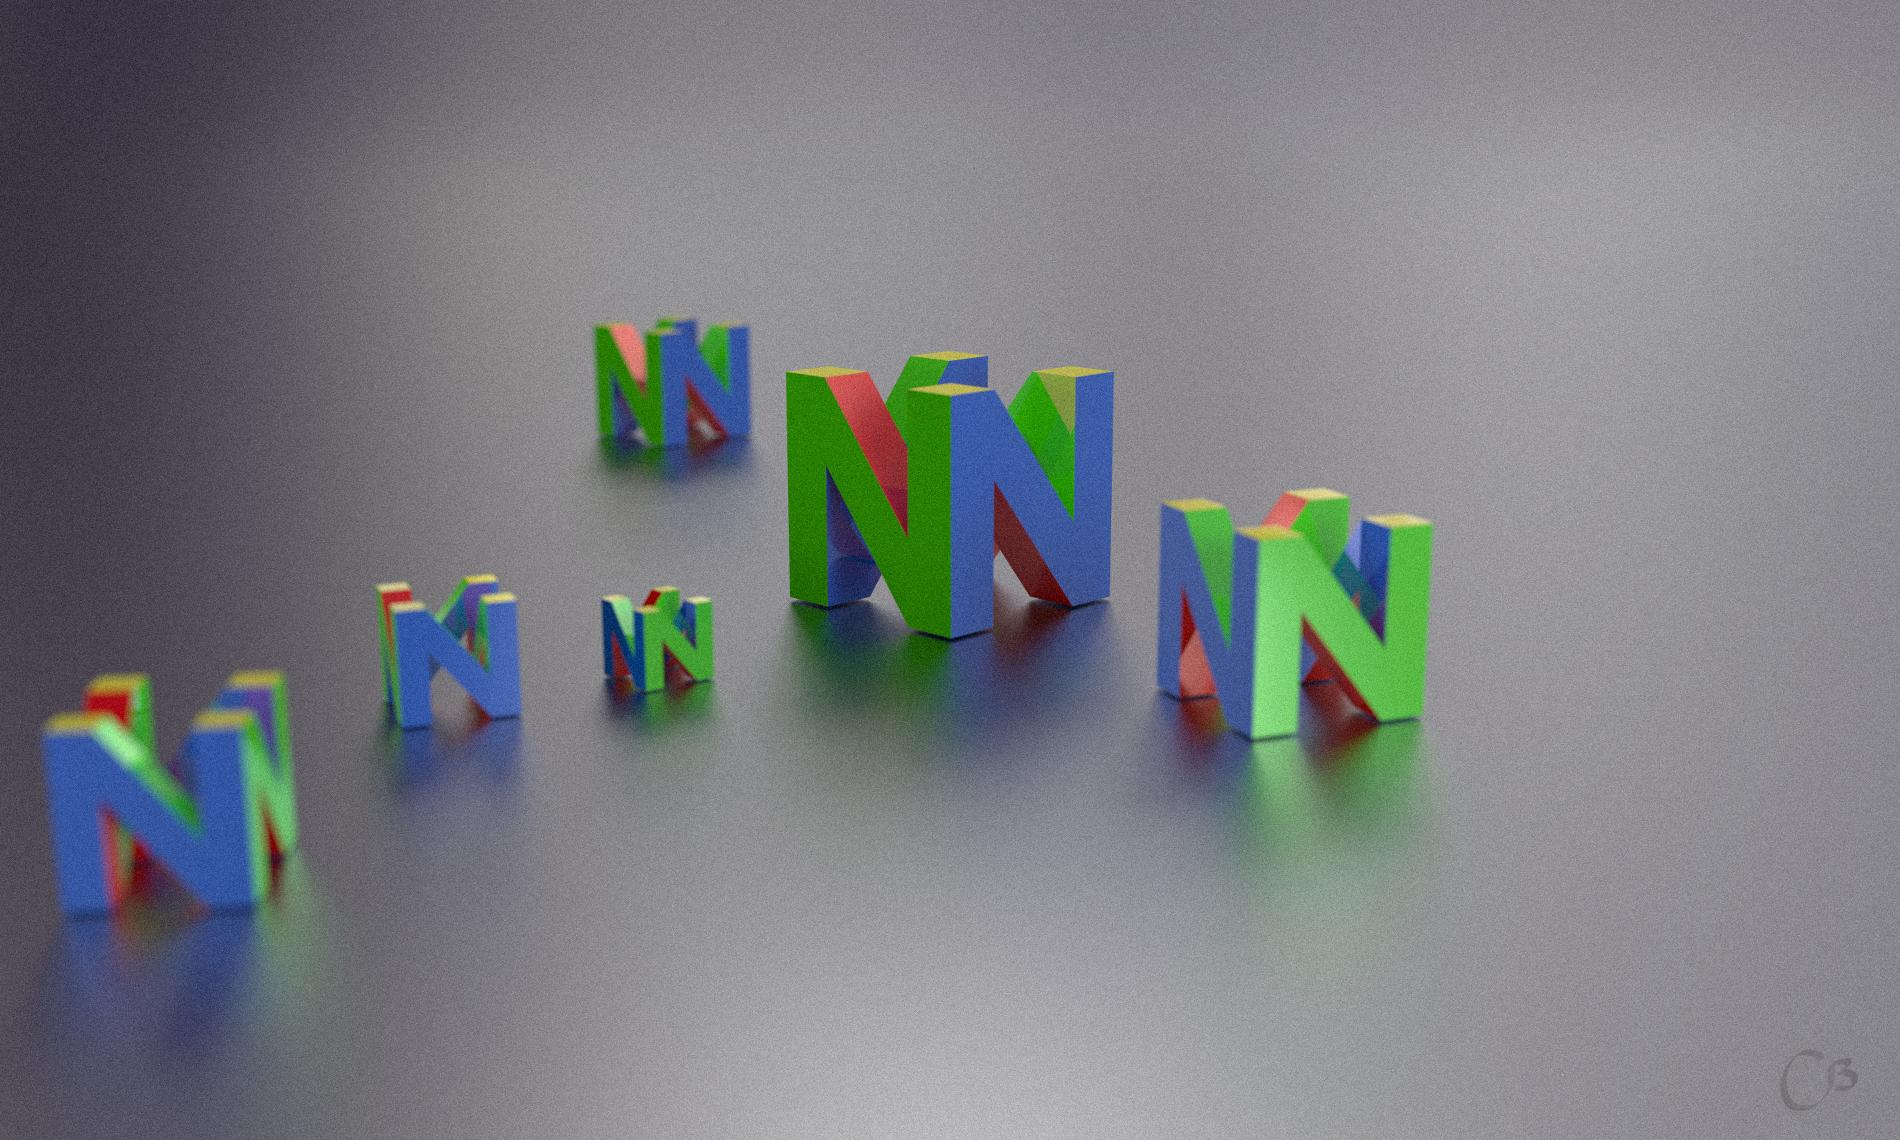 n64 logo hd wallpaper - HD1900×1140